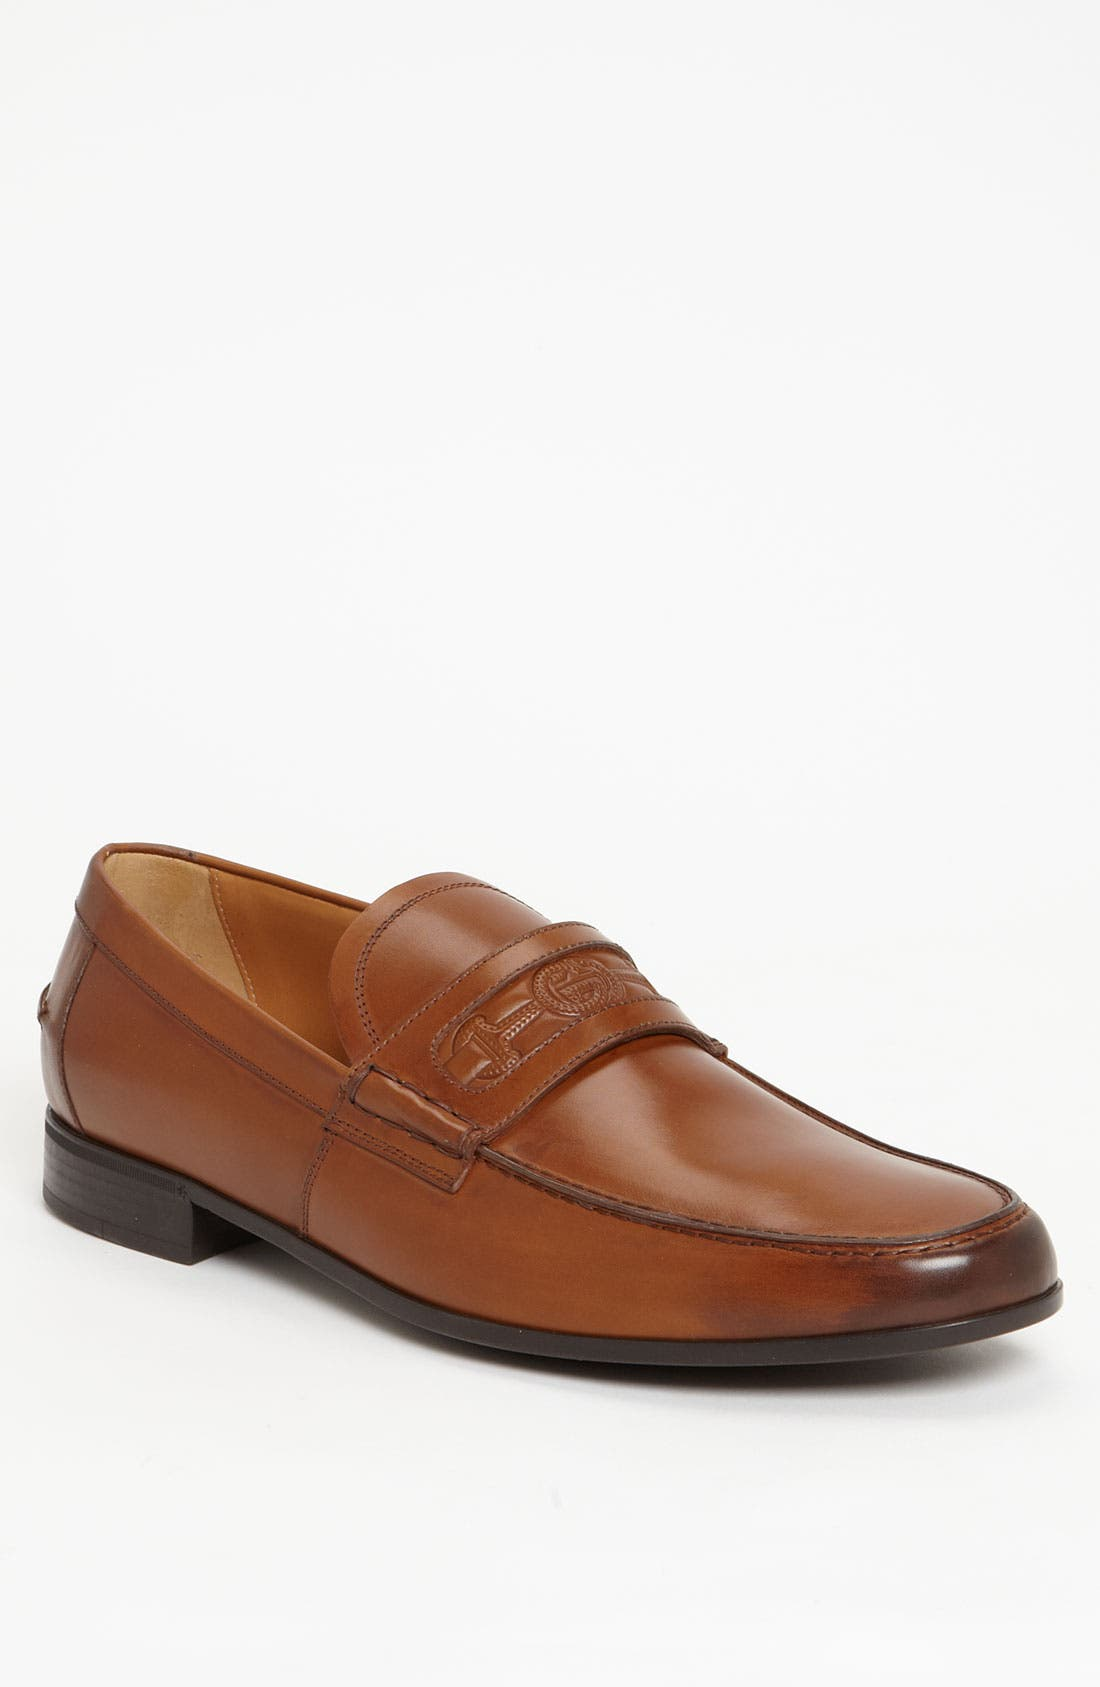 Alternate Image 1 Selected - Gucci 'Goudin' Loafer